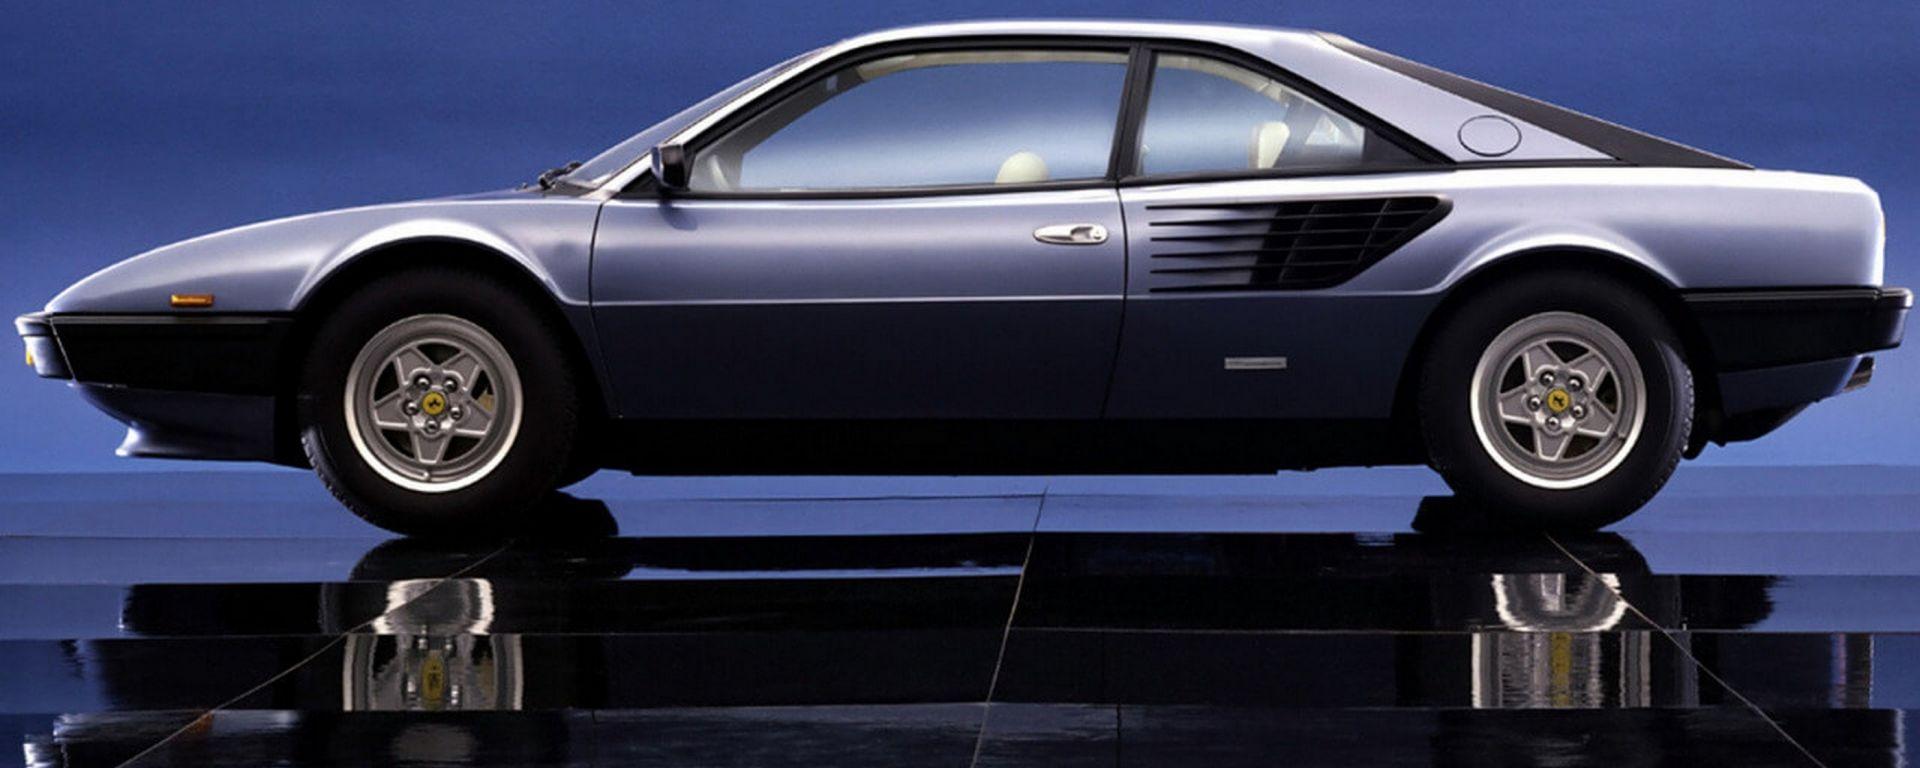 Le 10 auto flop più cercate su Autoscout